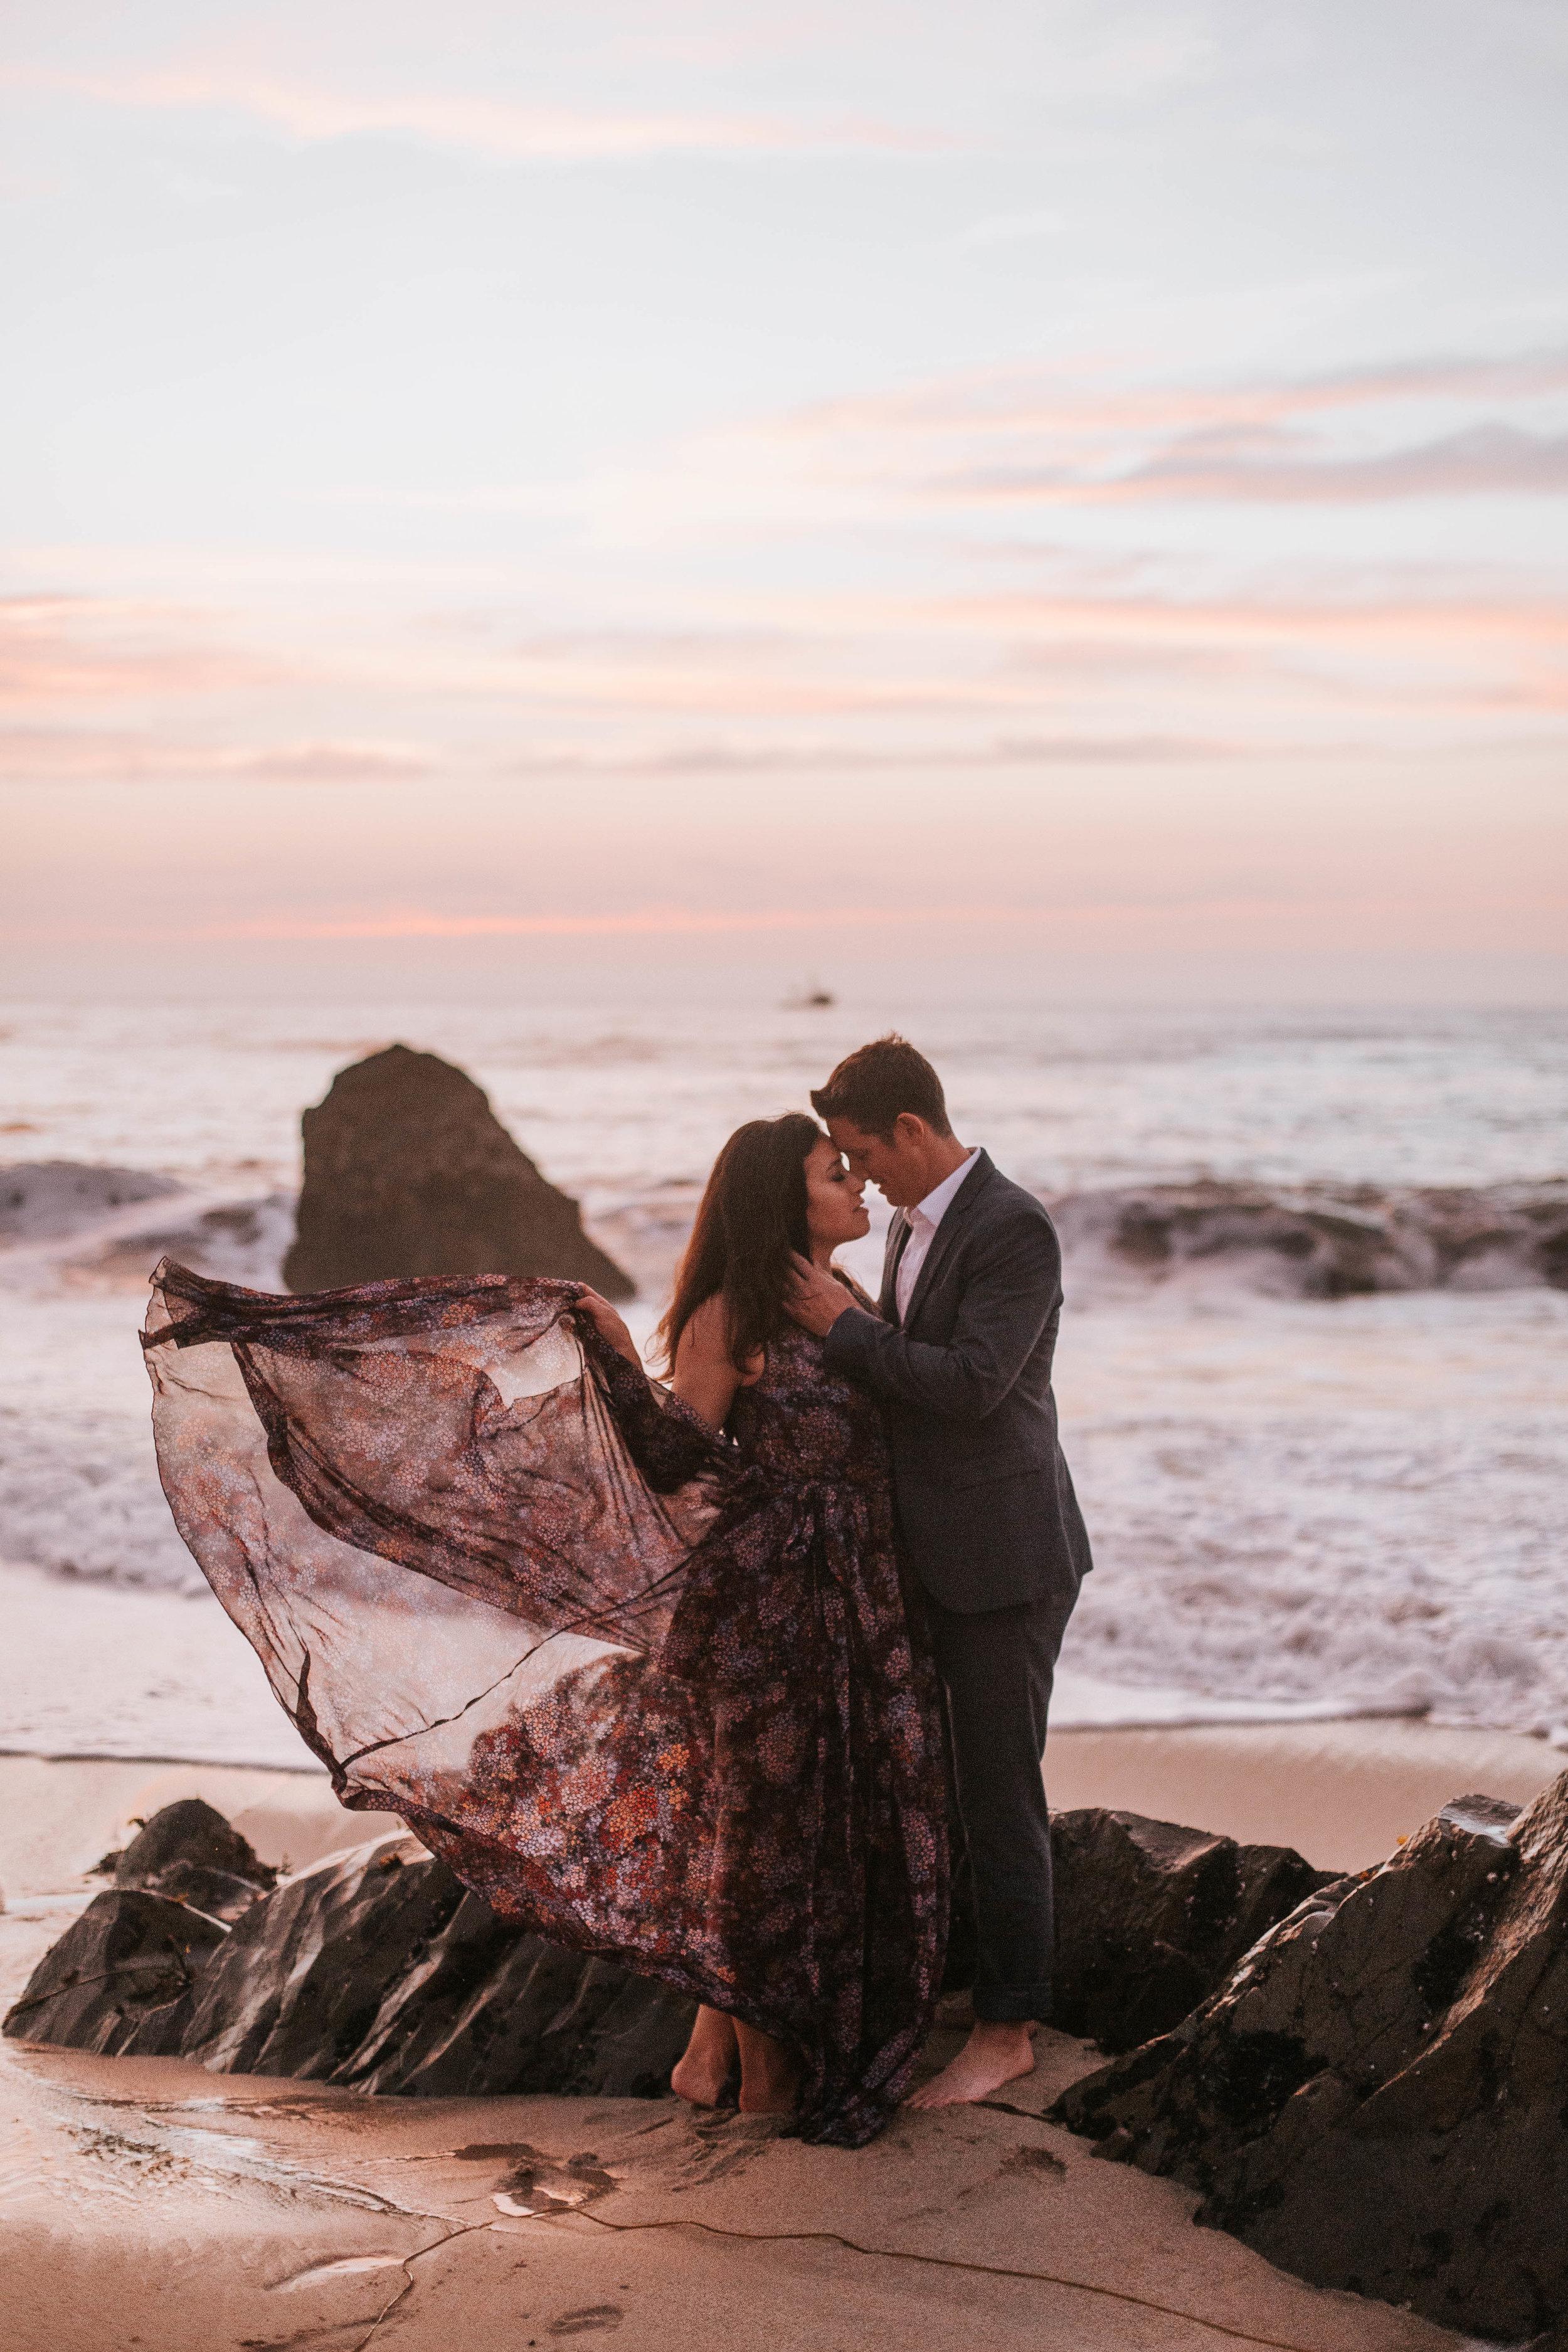 nicole-daacke-photography-big-sur-california-coast-adventure-engagement-photos-adventurous-elopement-intimate-wedding-photographer-golden-coastal-cali-engagement-session-34.jpg